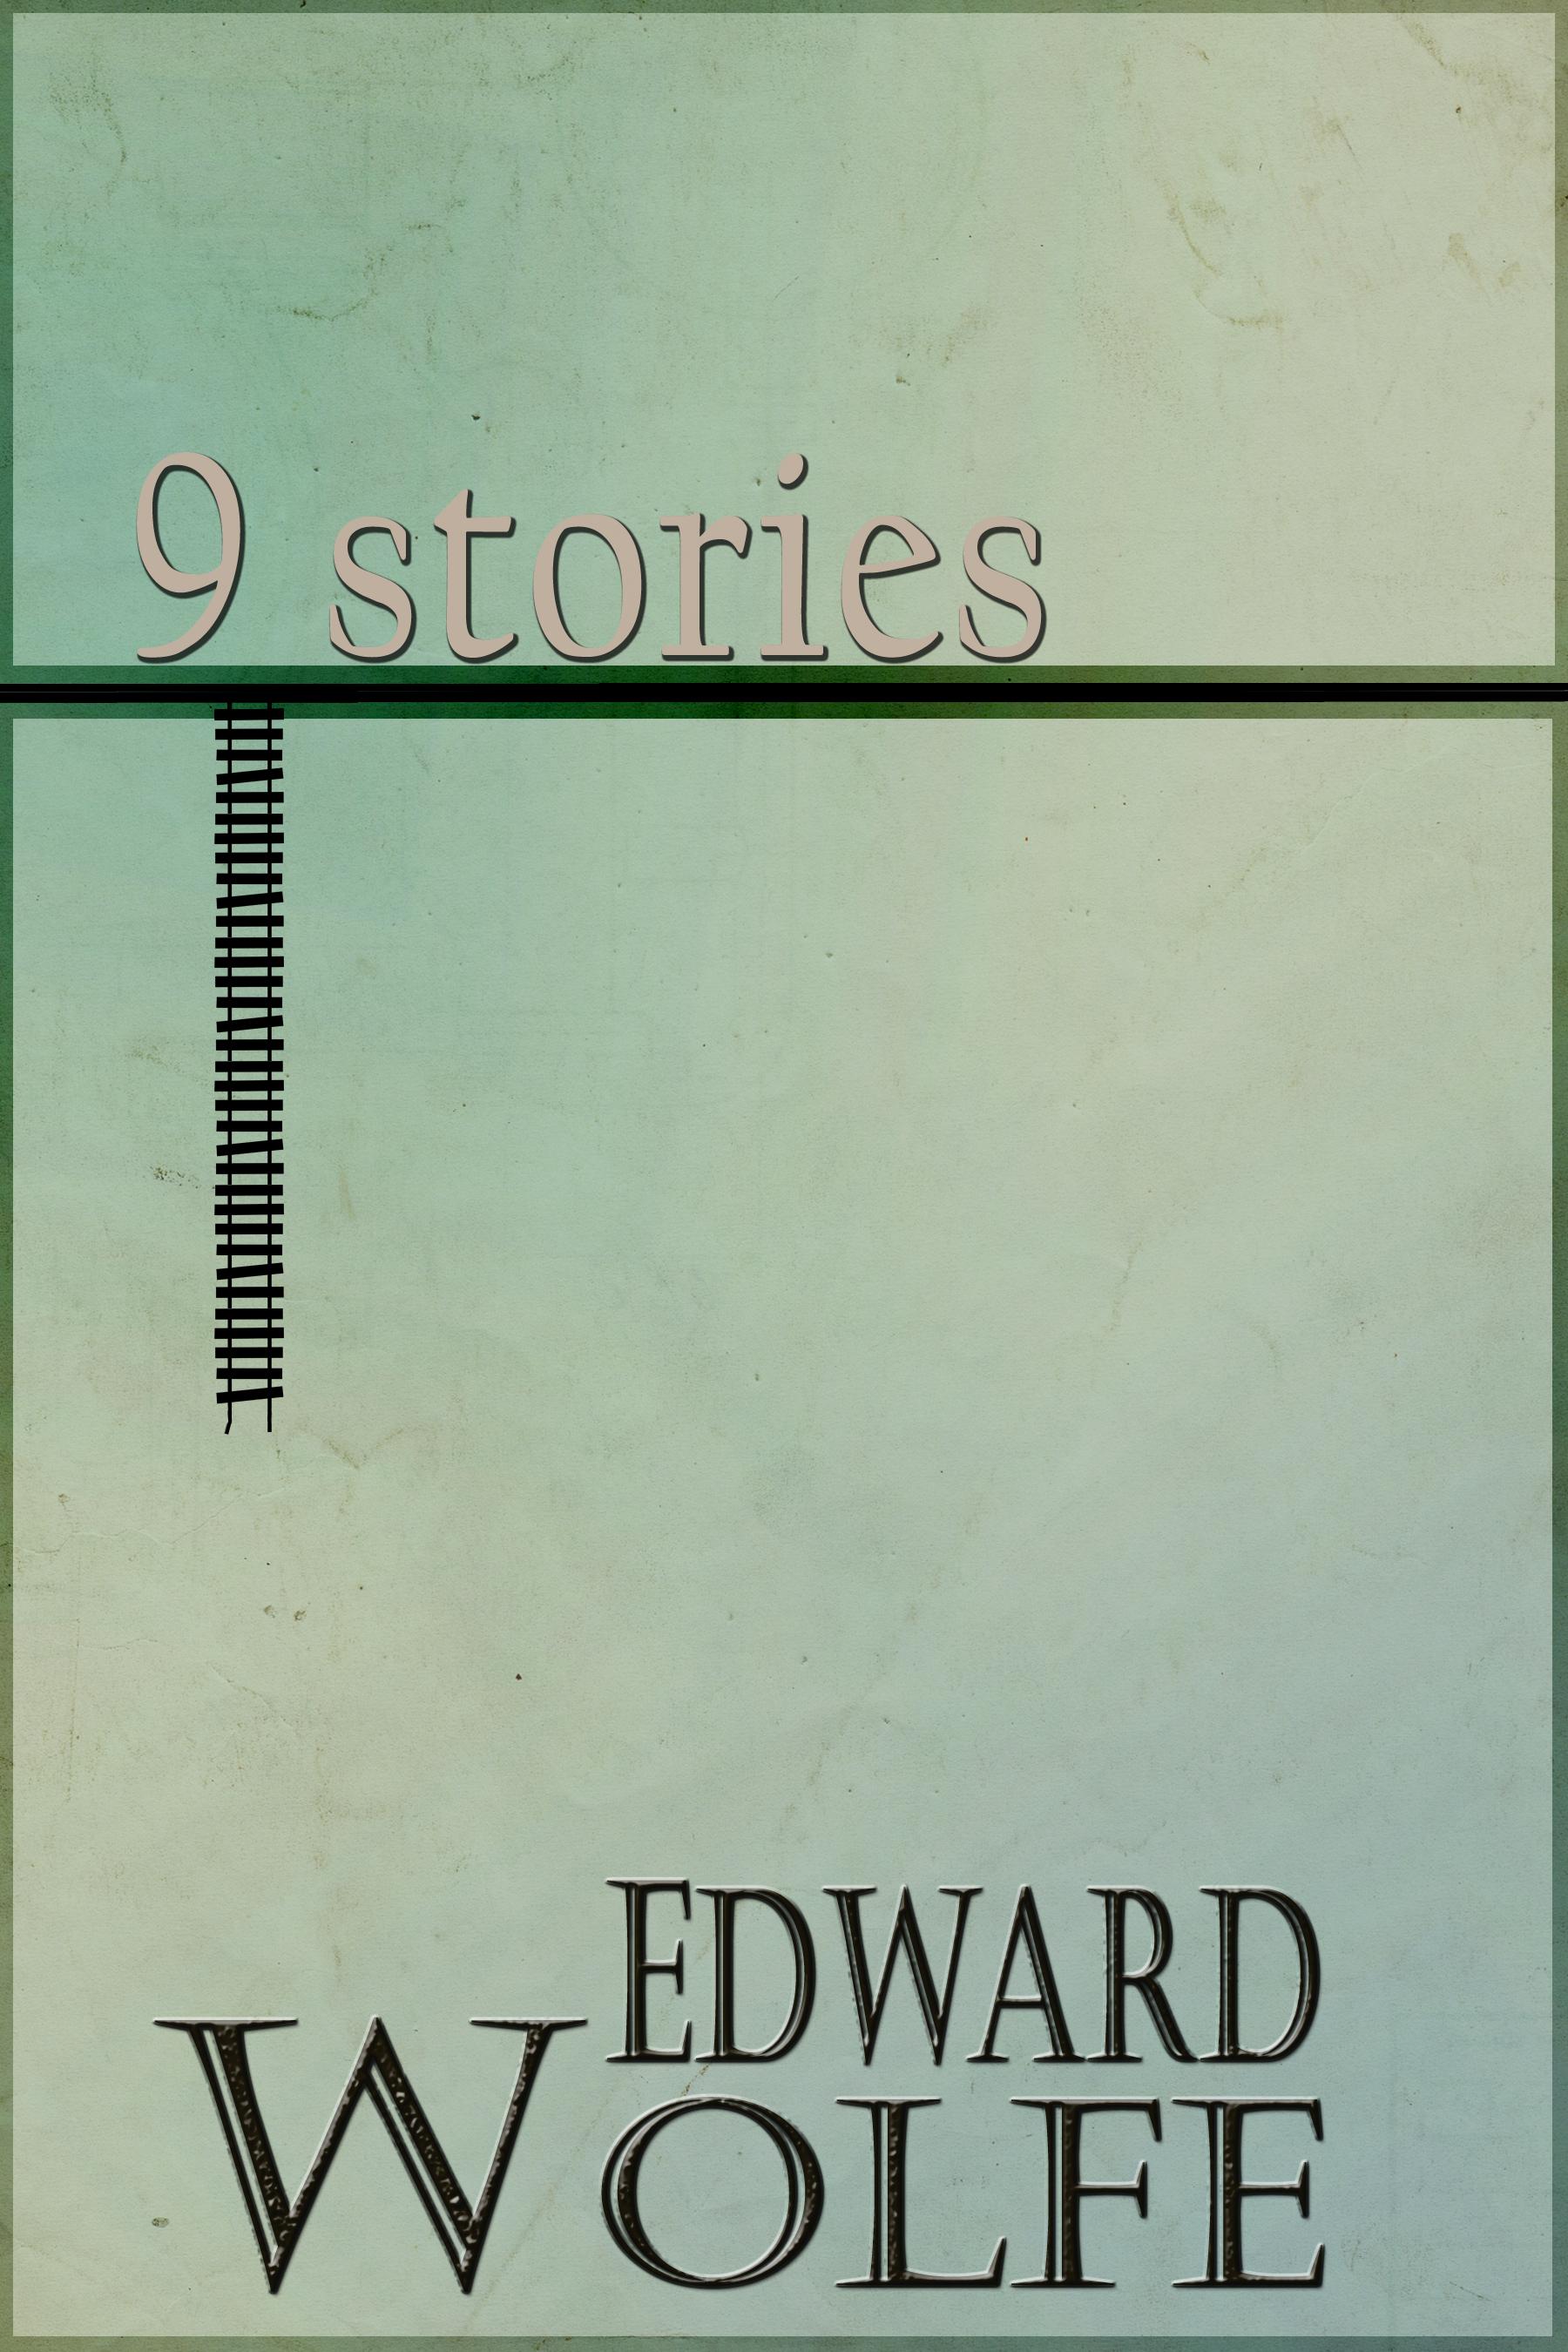 9 stories